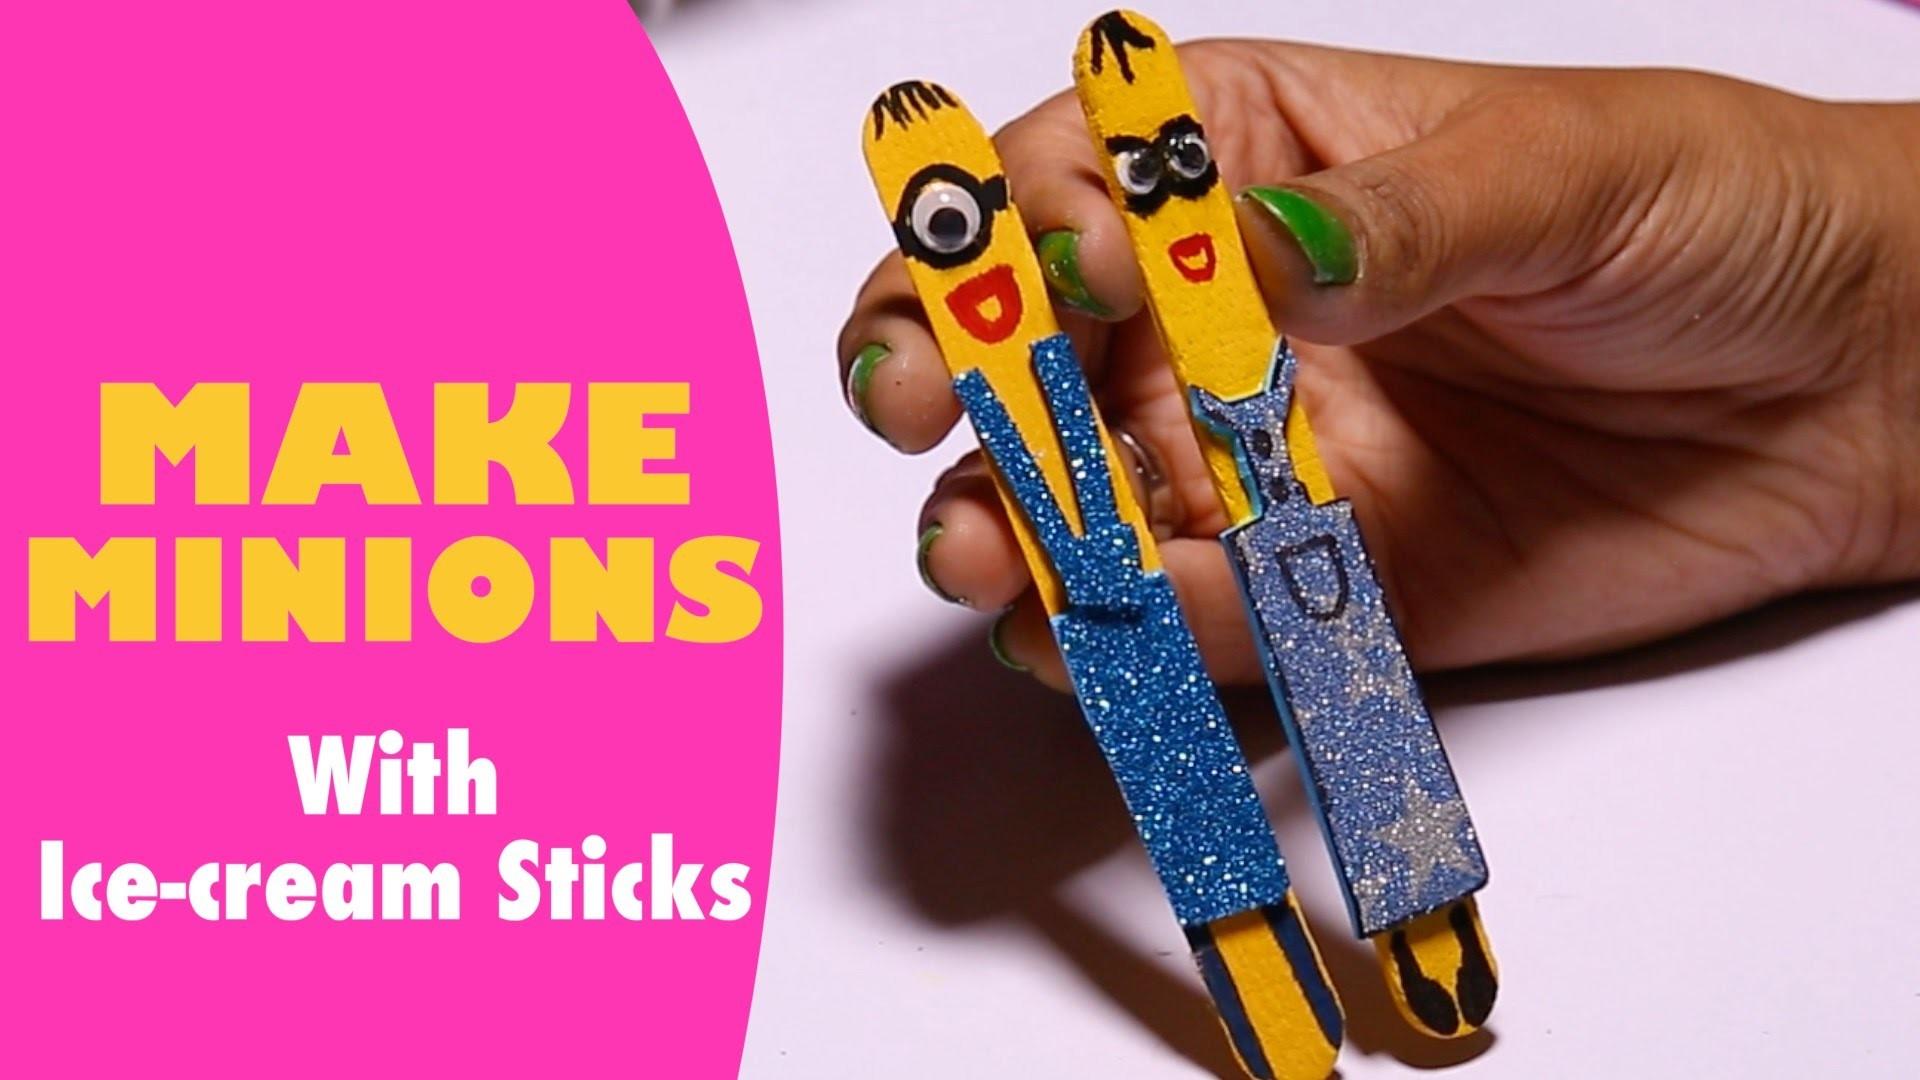 How to Make Minions with Ice cream Sticks - Super Kids